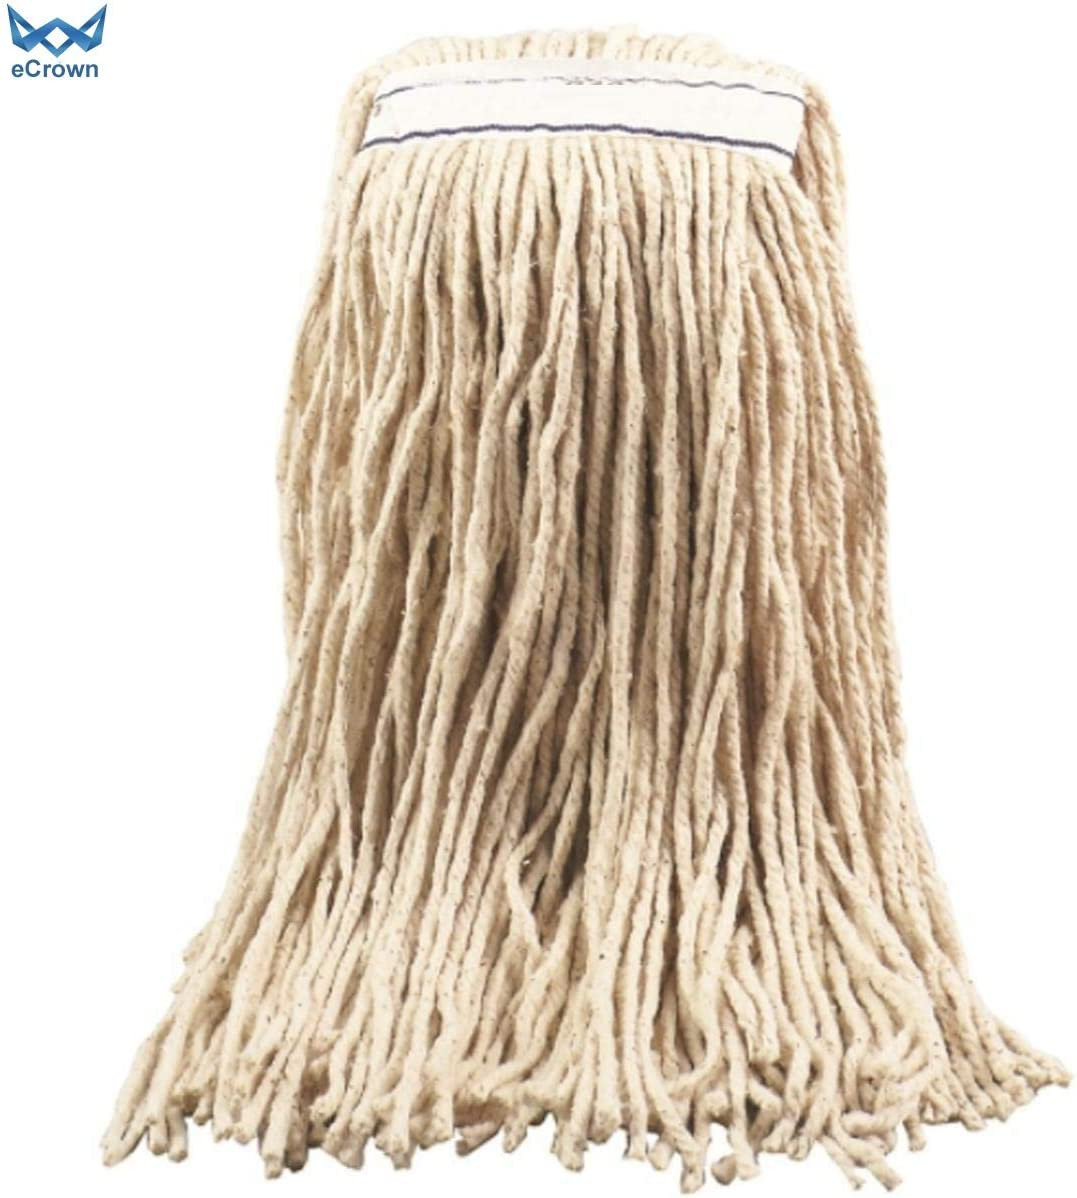 eCrown Kentucky Mop Head Multifold 16oz